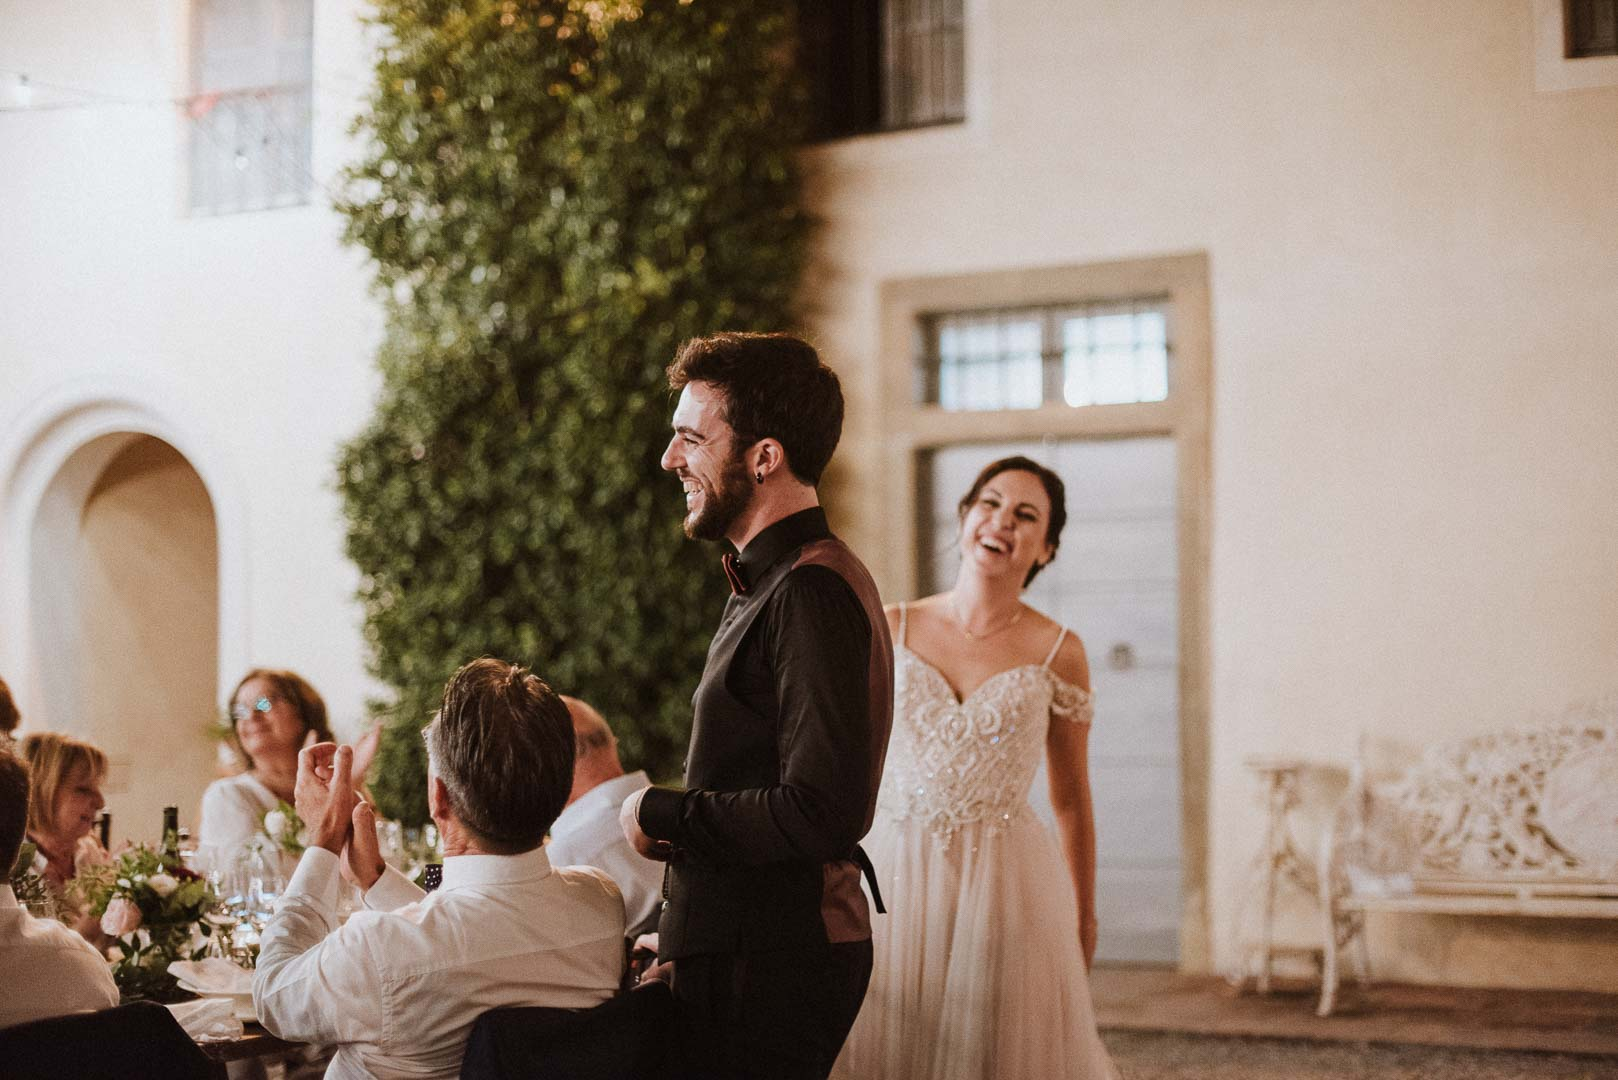 wedding-photographer-destination-fineart-bespoke-reportage-tuscany-villascorzi-vivianeizzo-spazio46-174